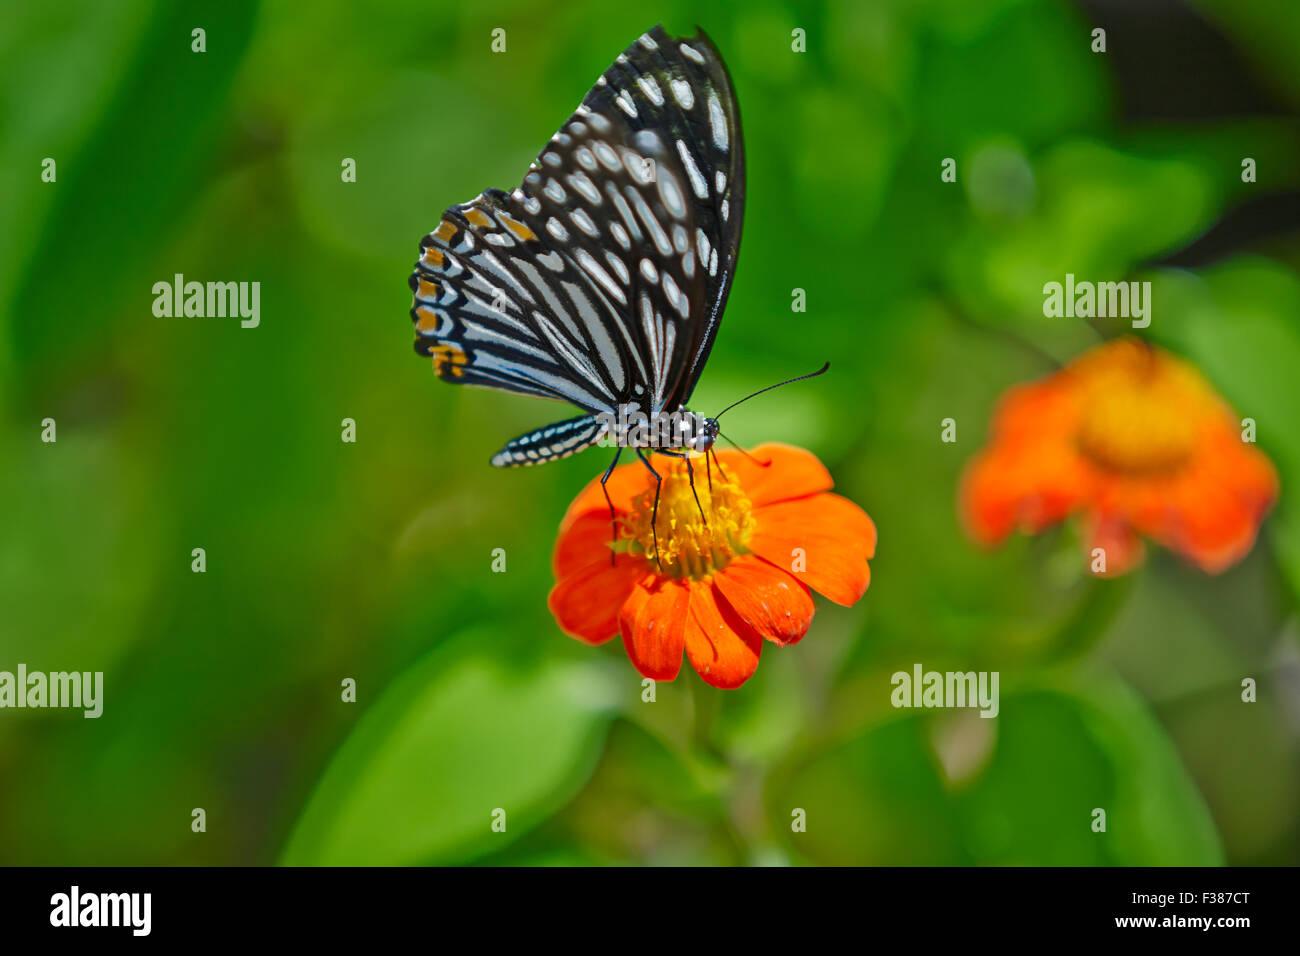 La forma de mariposa, Mime comunes Dissimilis en una flor. Nombre científico: Papilio clytia. Banteay Srei Imagen De Stock